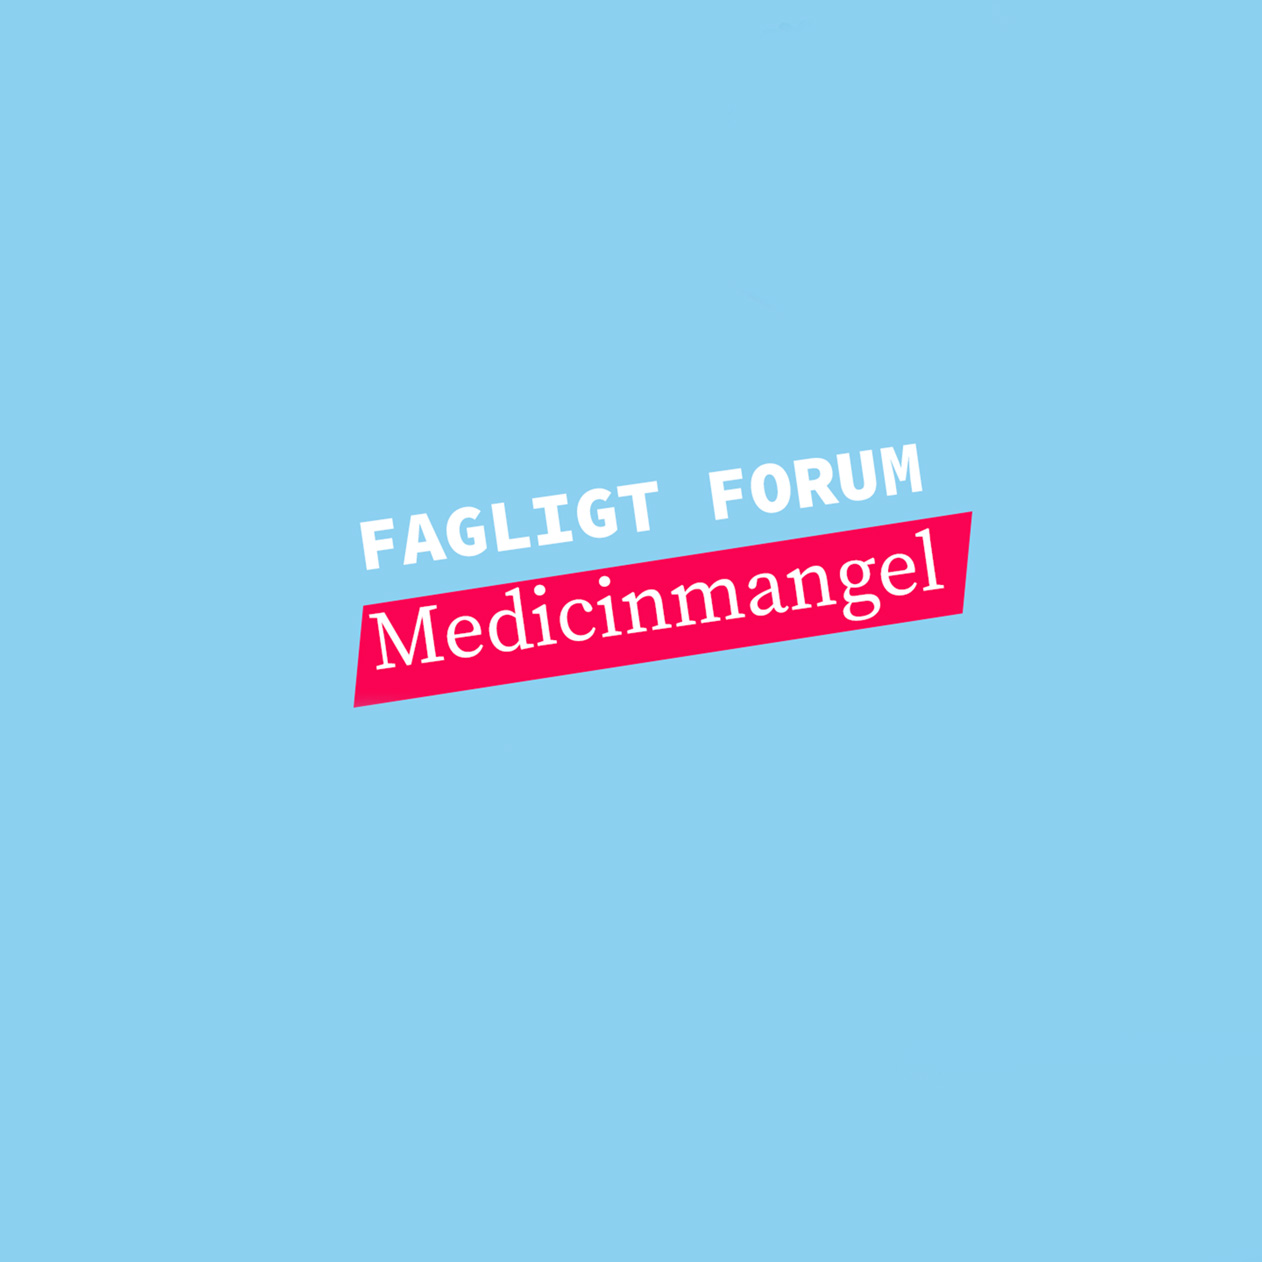 Fagligt Forum om medicinmangel – følg med via Facebook